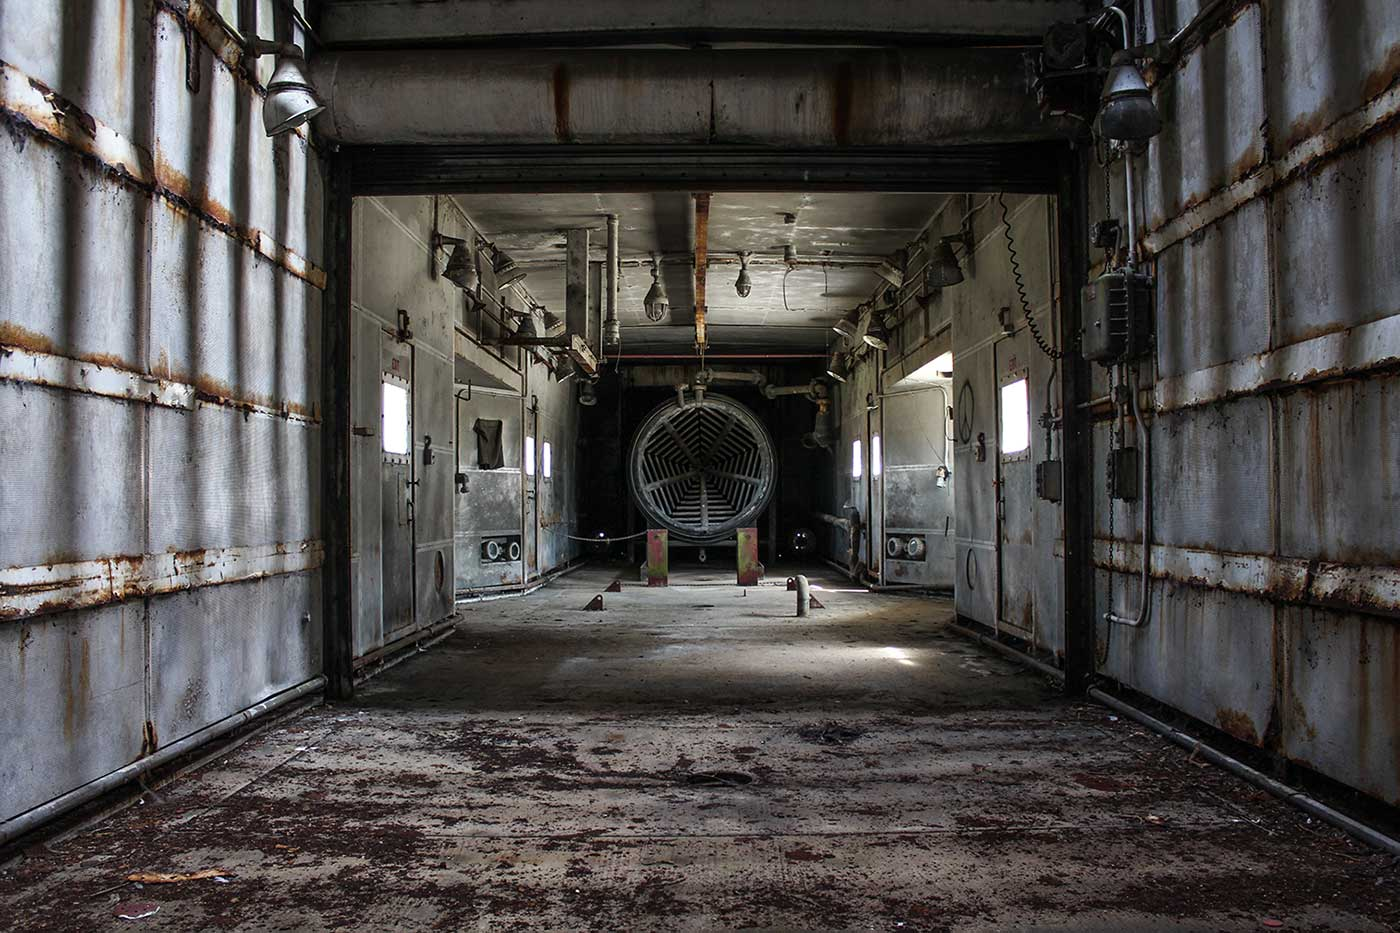 USAF Upper Heyford - 4 Testing Bay 2